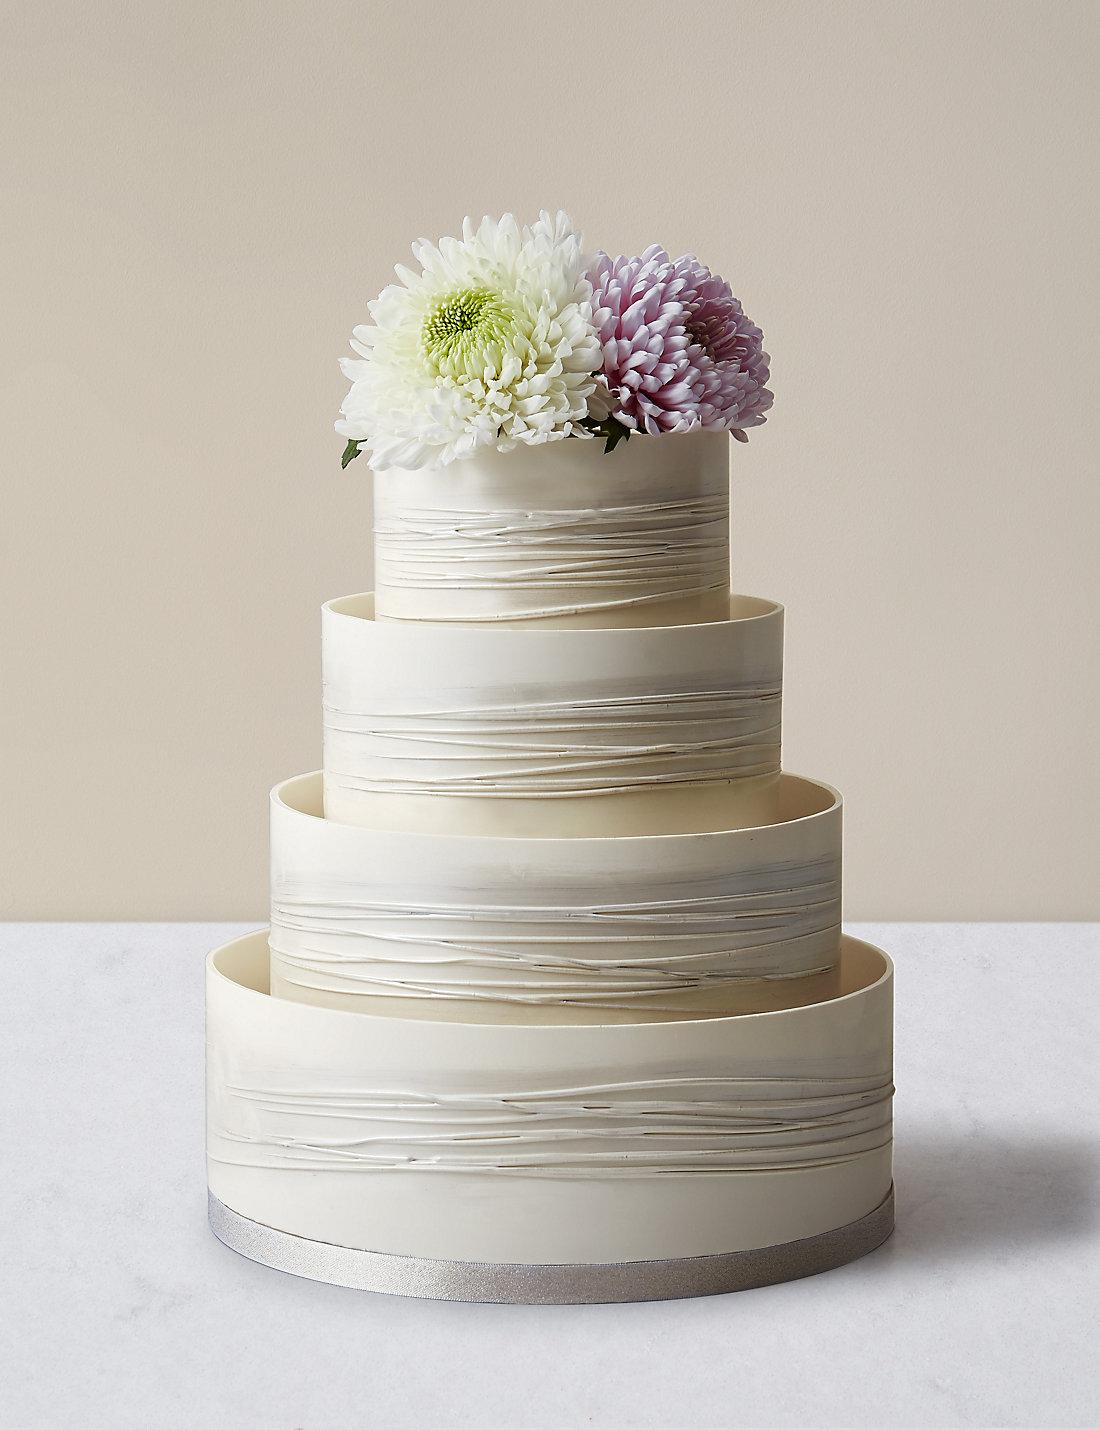 Shimmering Hoop Chocolate Wedding Cake (White & Silver) | M&S